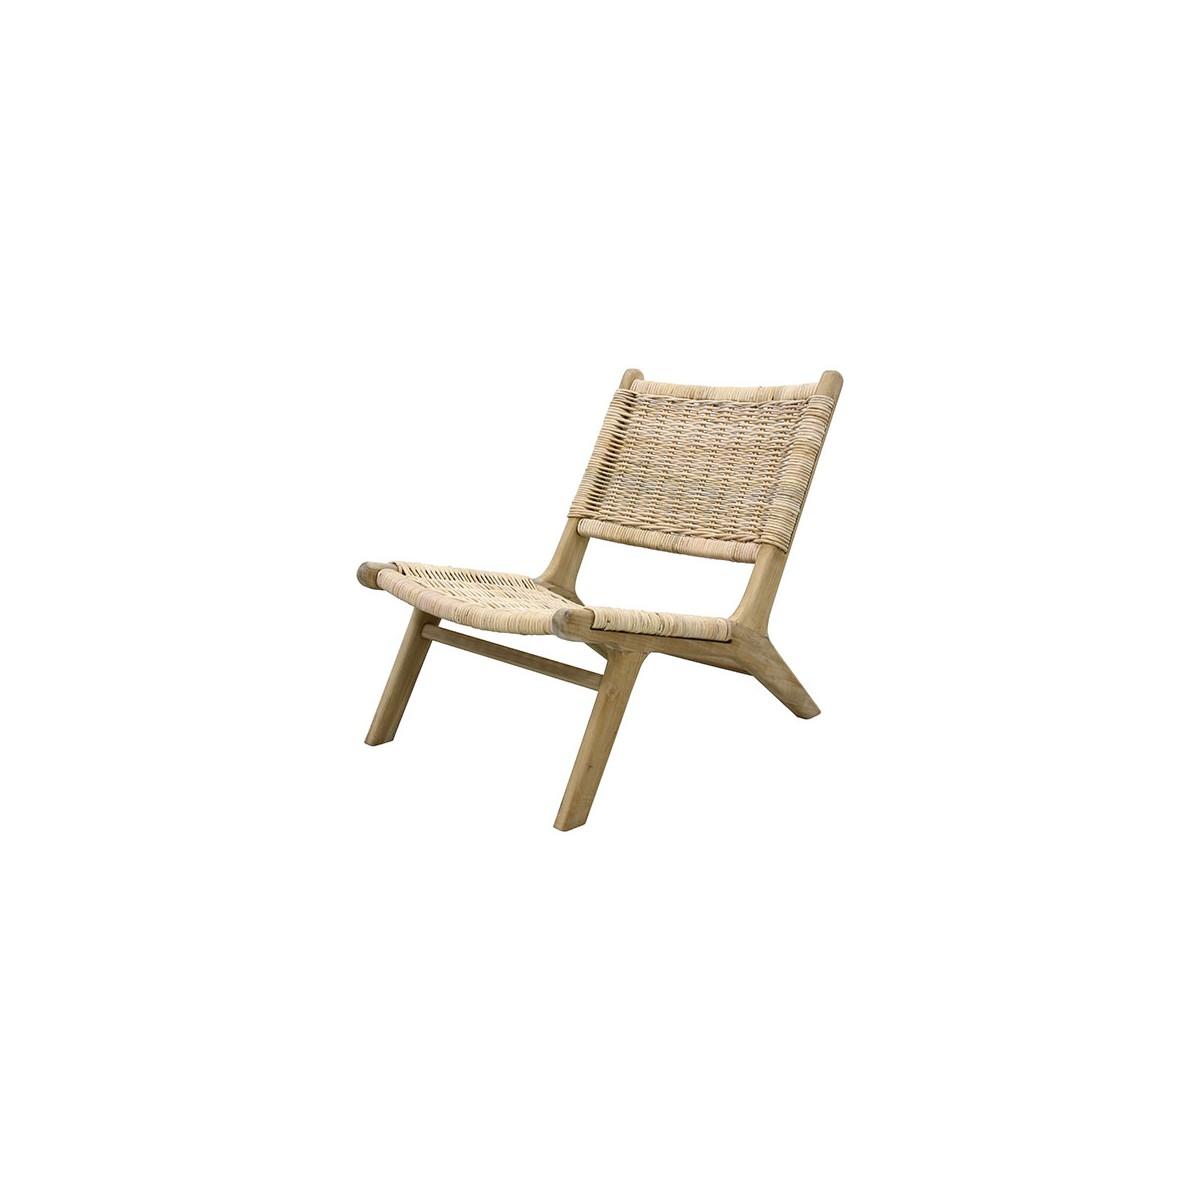 Chaise de repos wicker en osier naturel hk living for Chaise de cuisine en osier